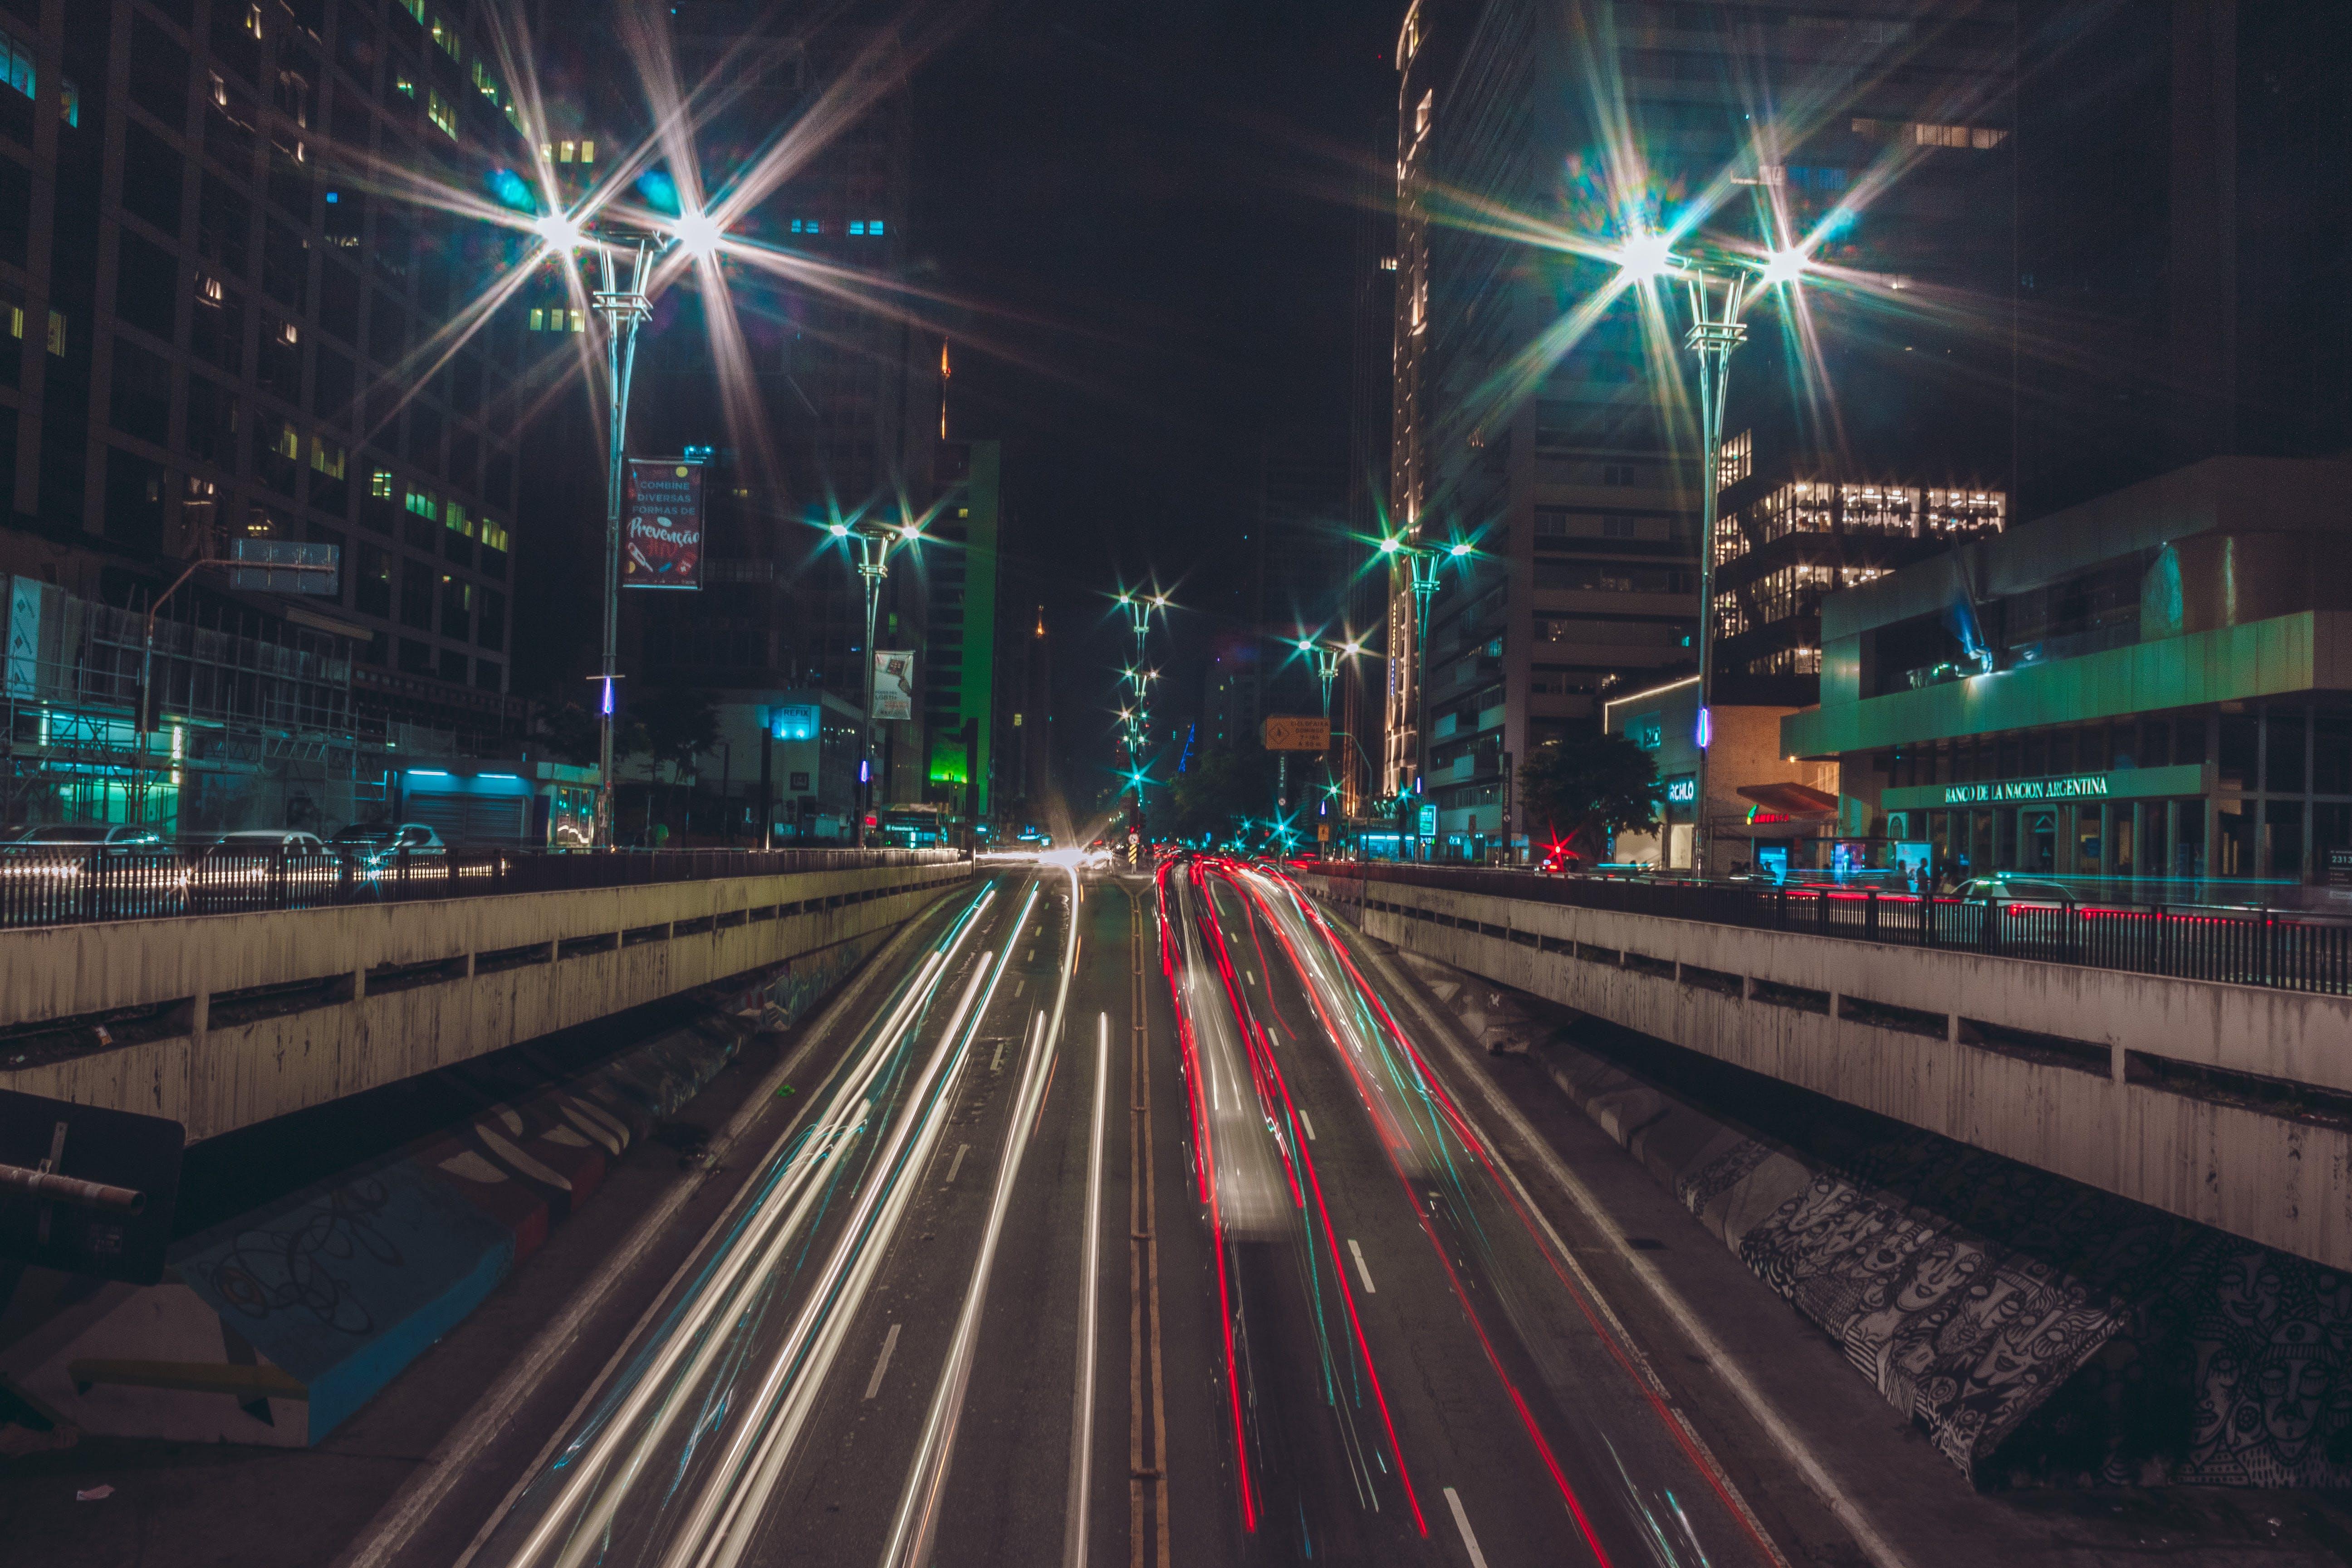 Free stock photo of lights, night, street, dark